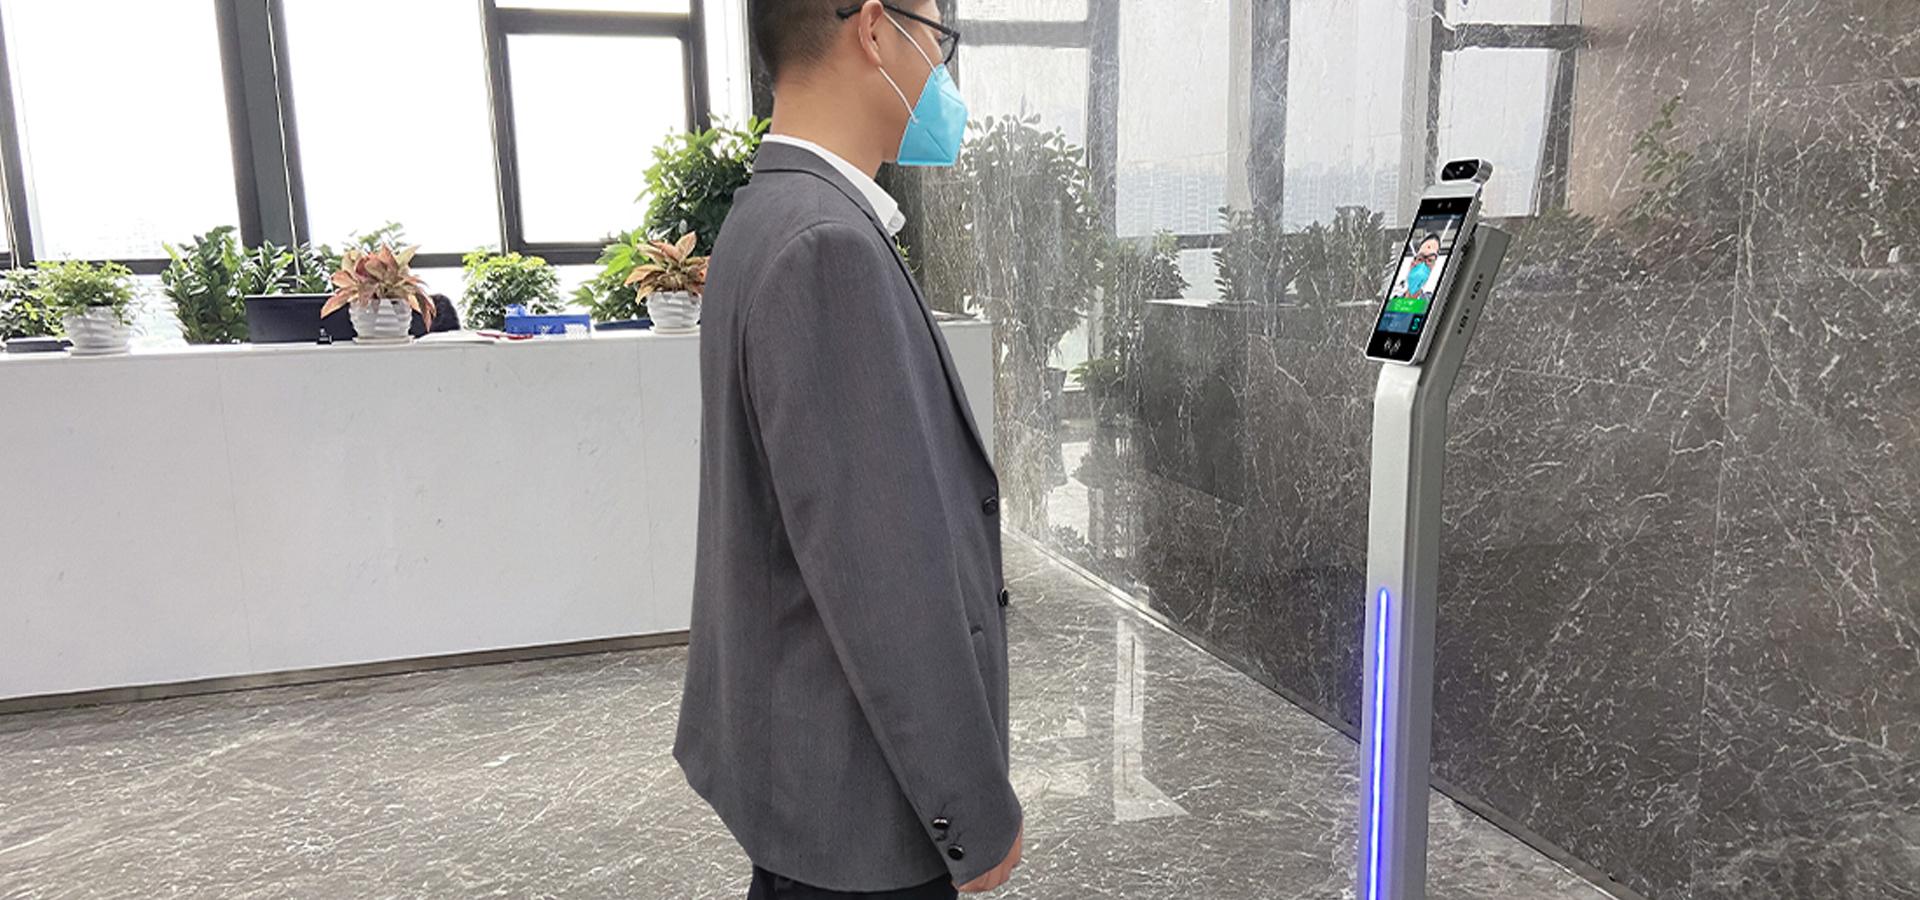 Face Recognitionเครื่อง/กล้องการวัดอุณหภูมิระบบ